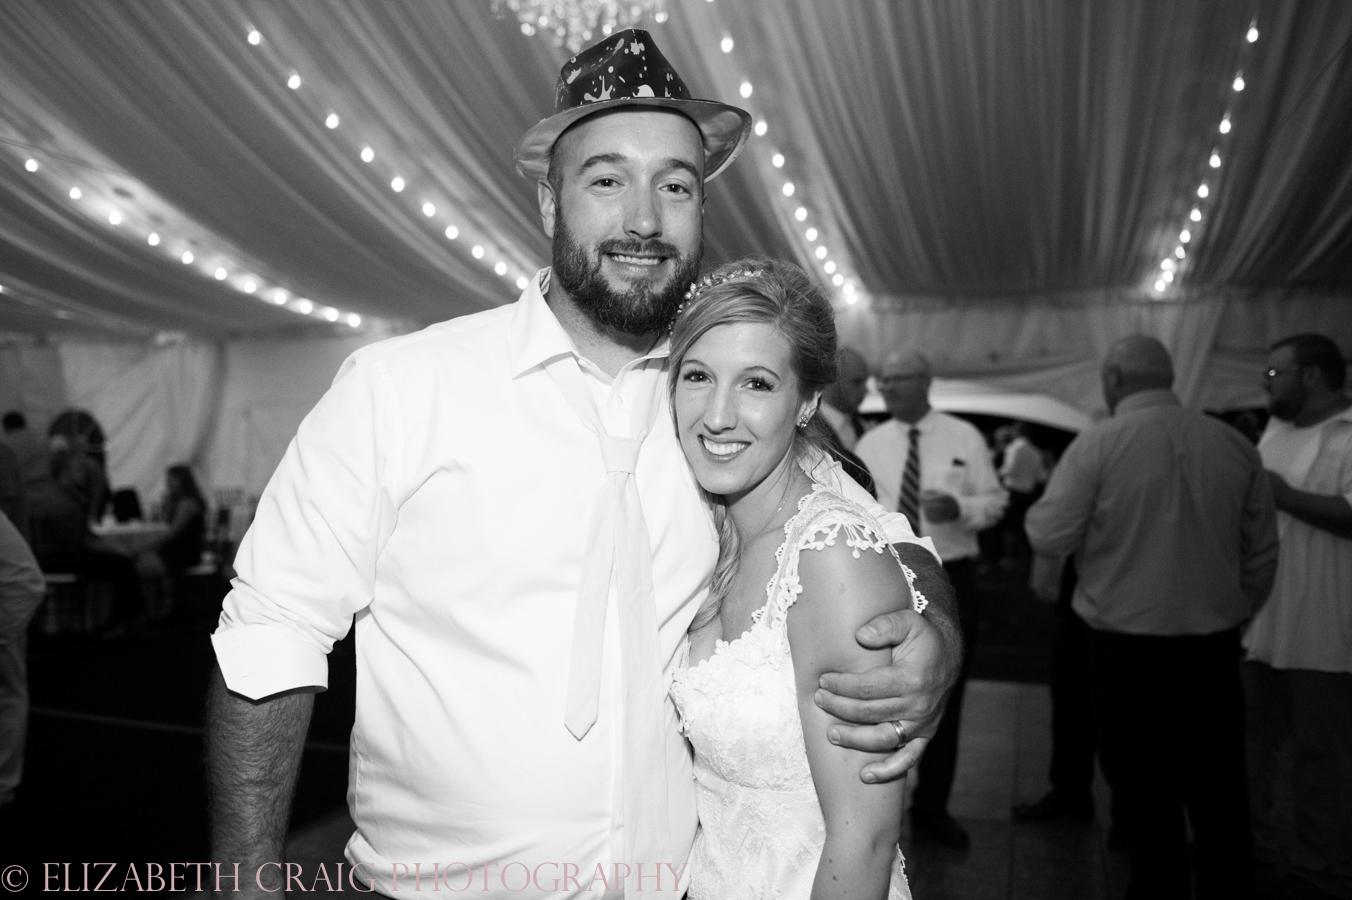 Dubois Brockway St. Marys PA Weddings-0285